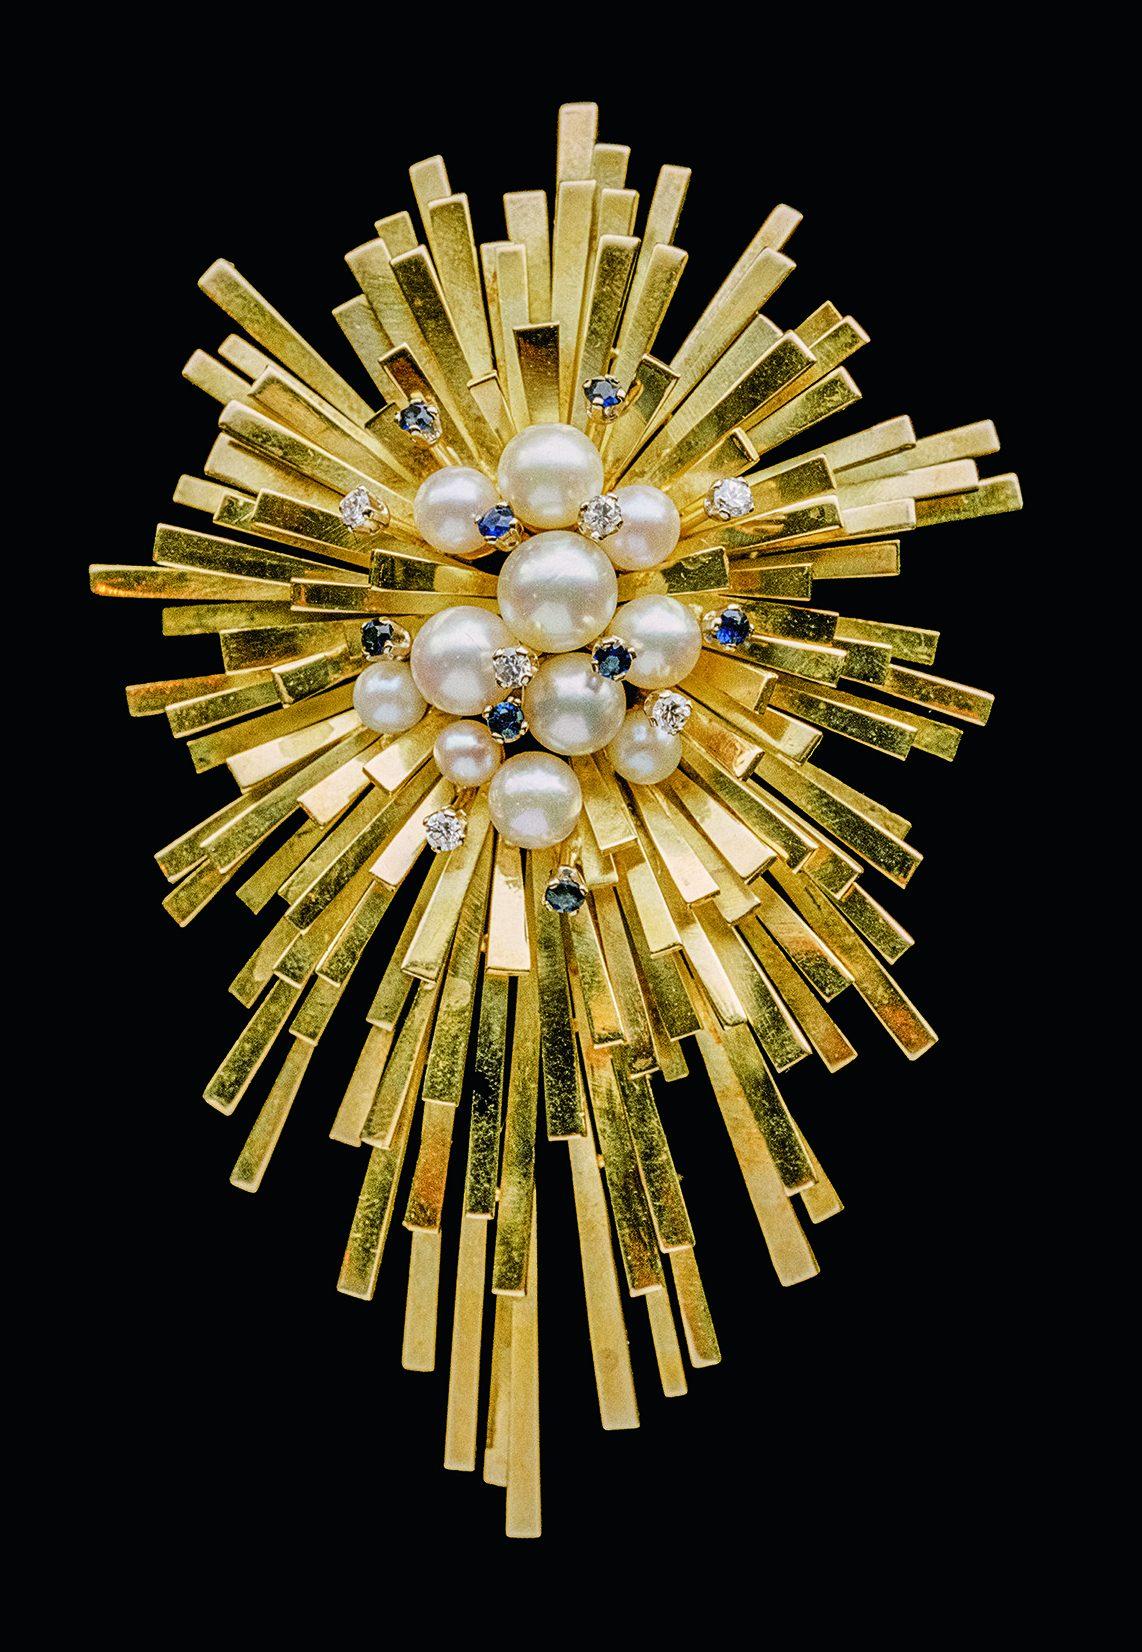 David Thomas, Starburst, hanger/broche, 1967. Foto David & Sonya Newell-Smith, goud, saffieren, parels, diamanten